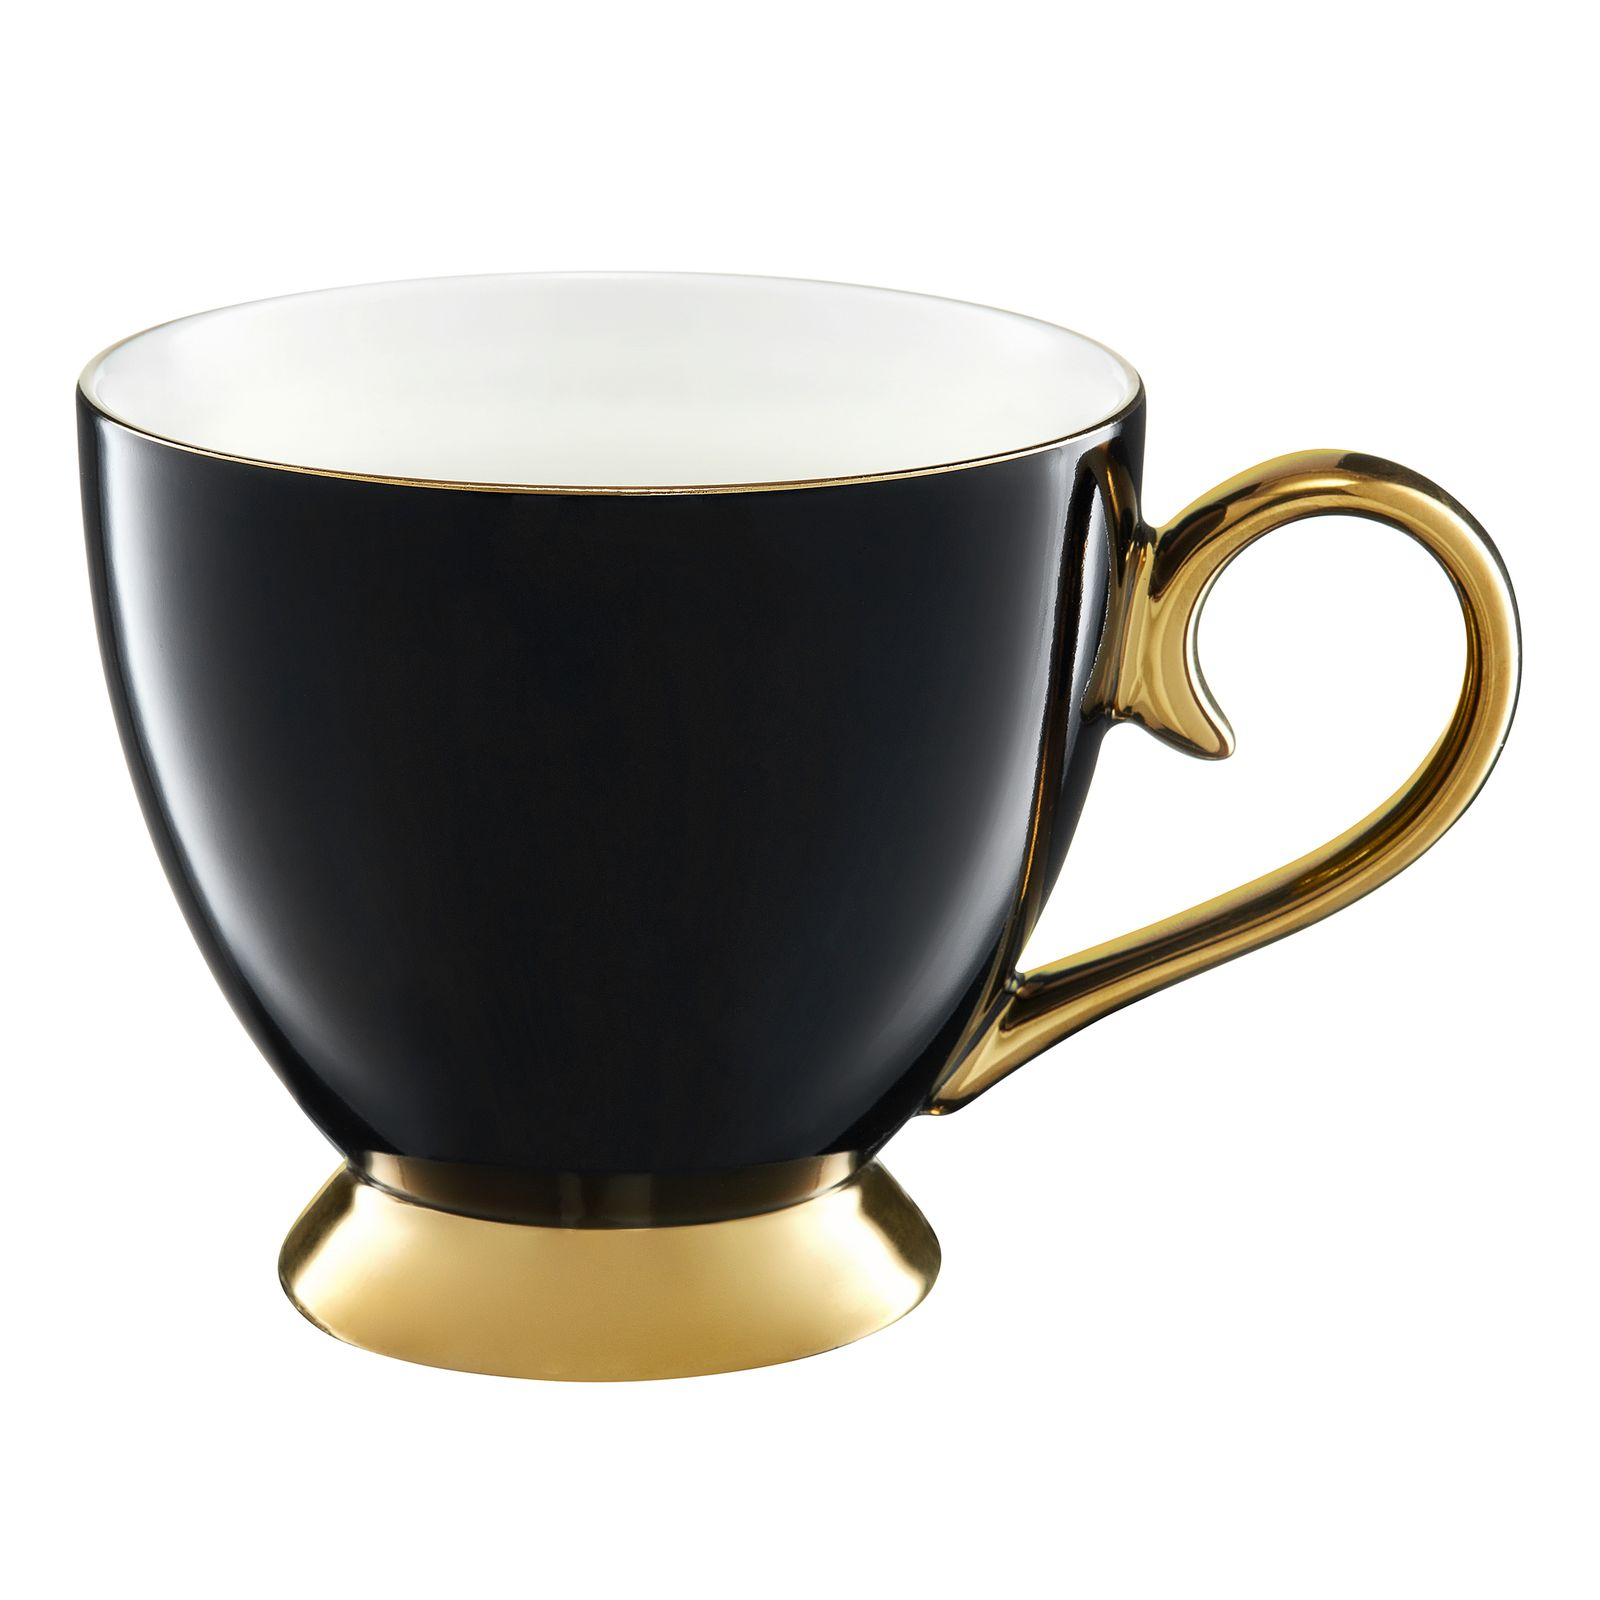 Becher Royal 400 ml schwarz-gold AMBITION